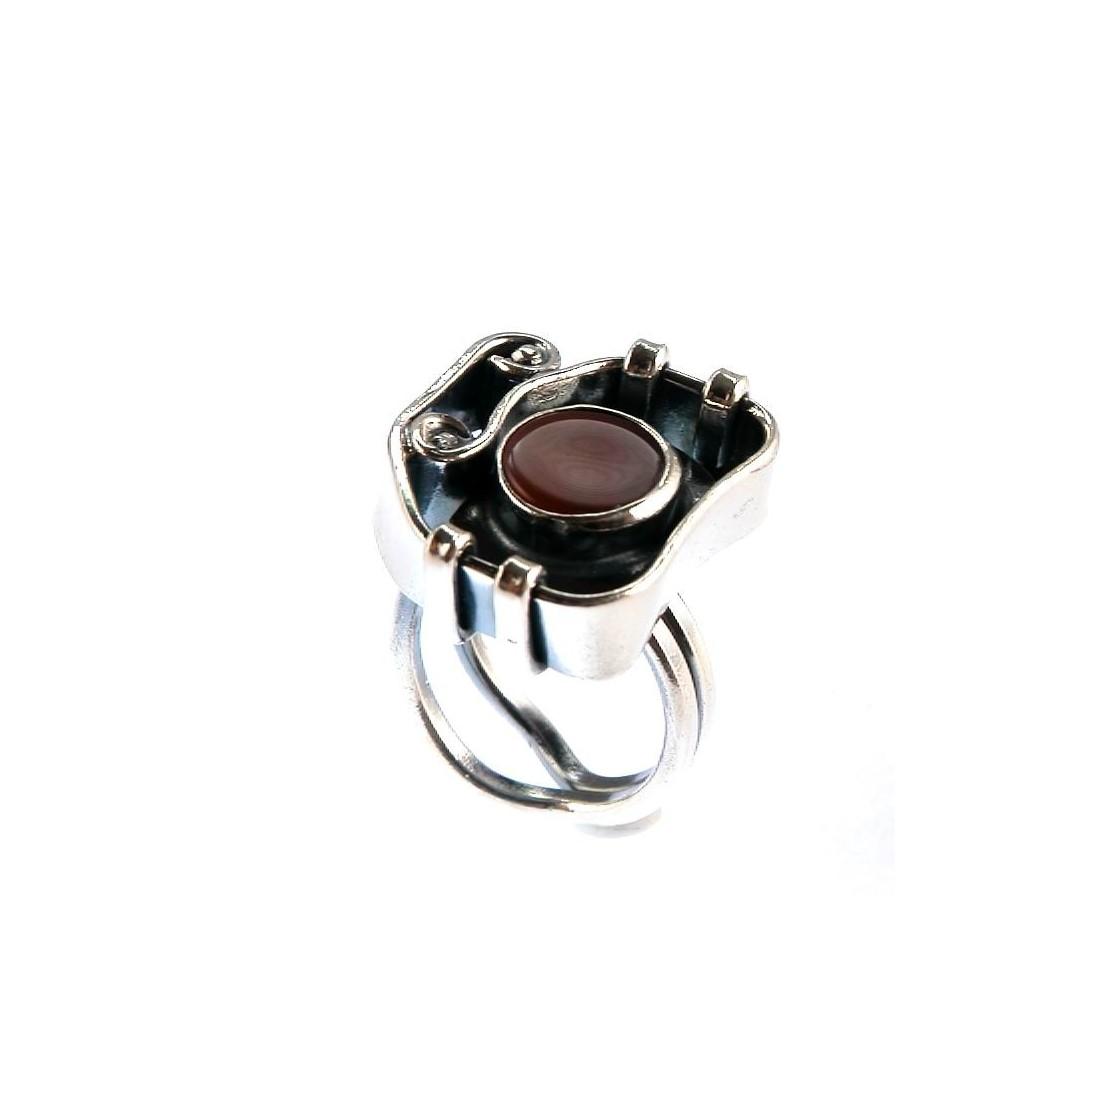 Bague artisanale avec la cornaline, bijou artisanale